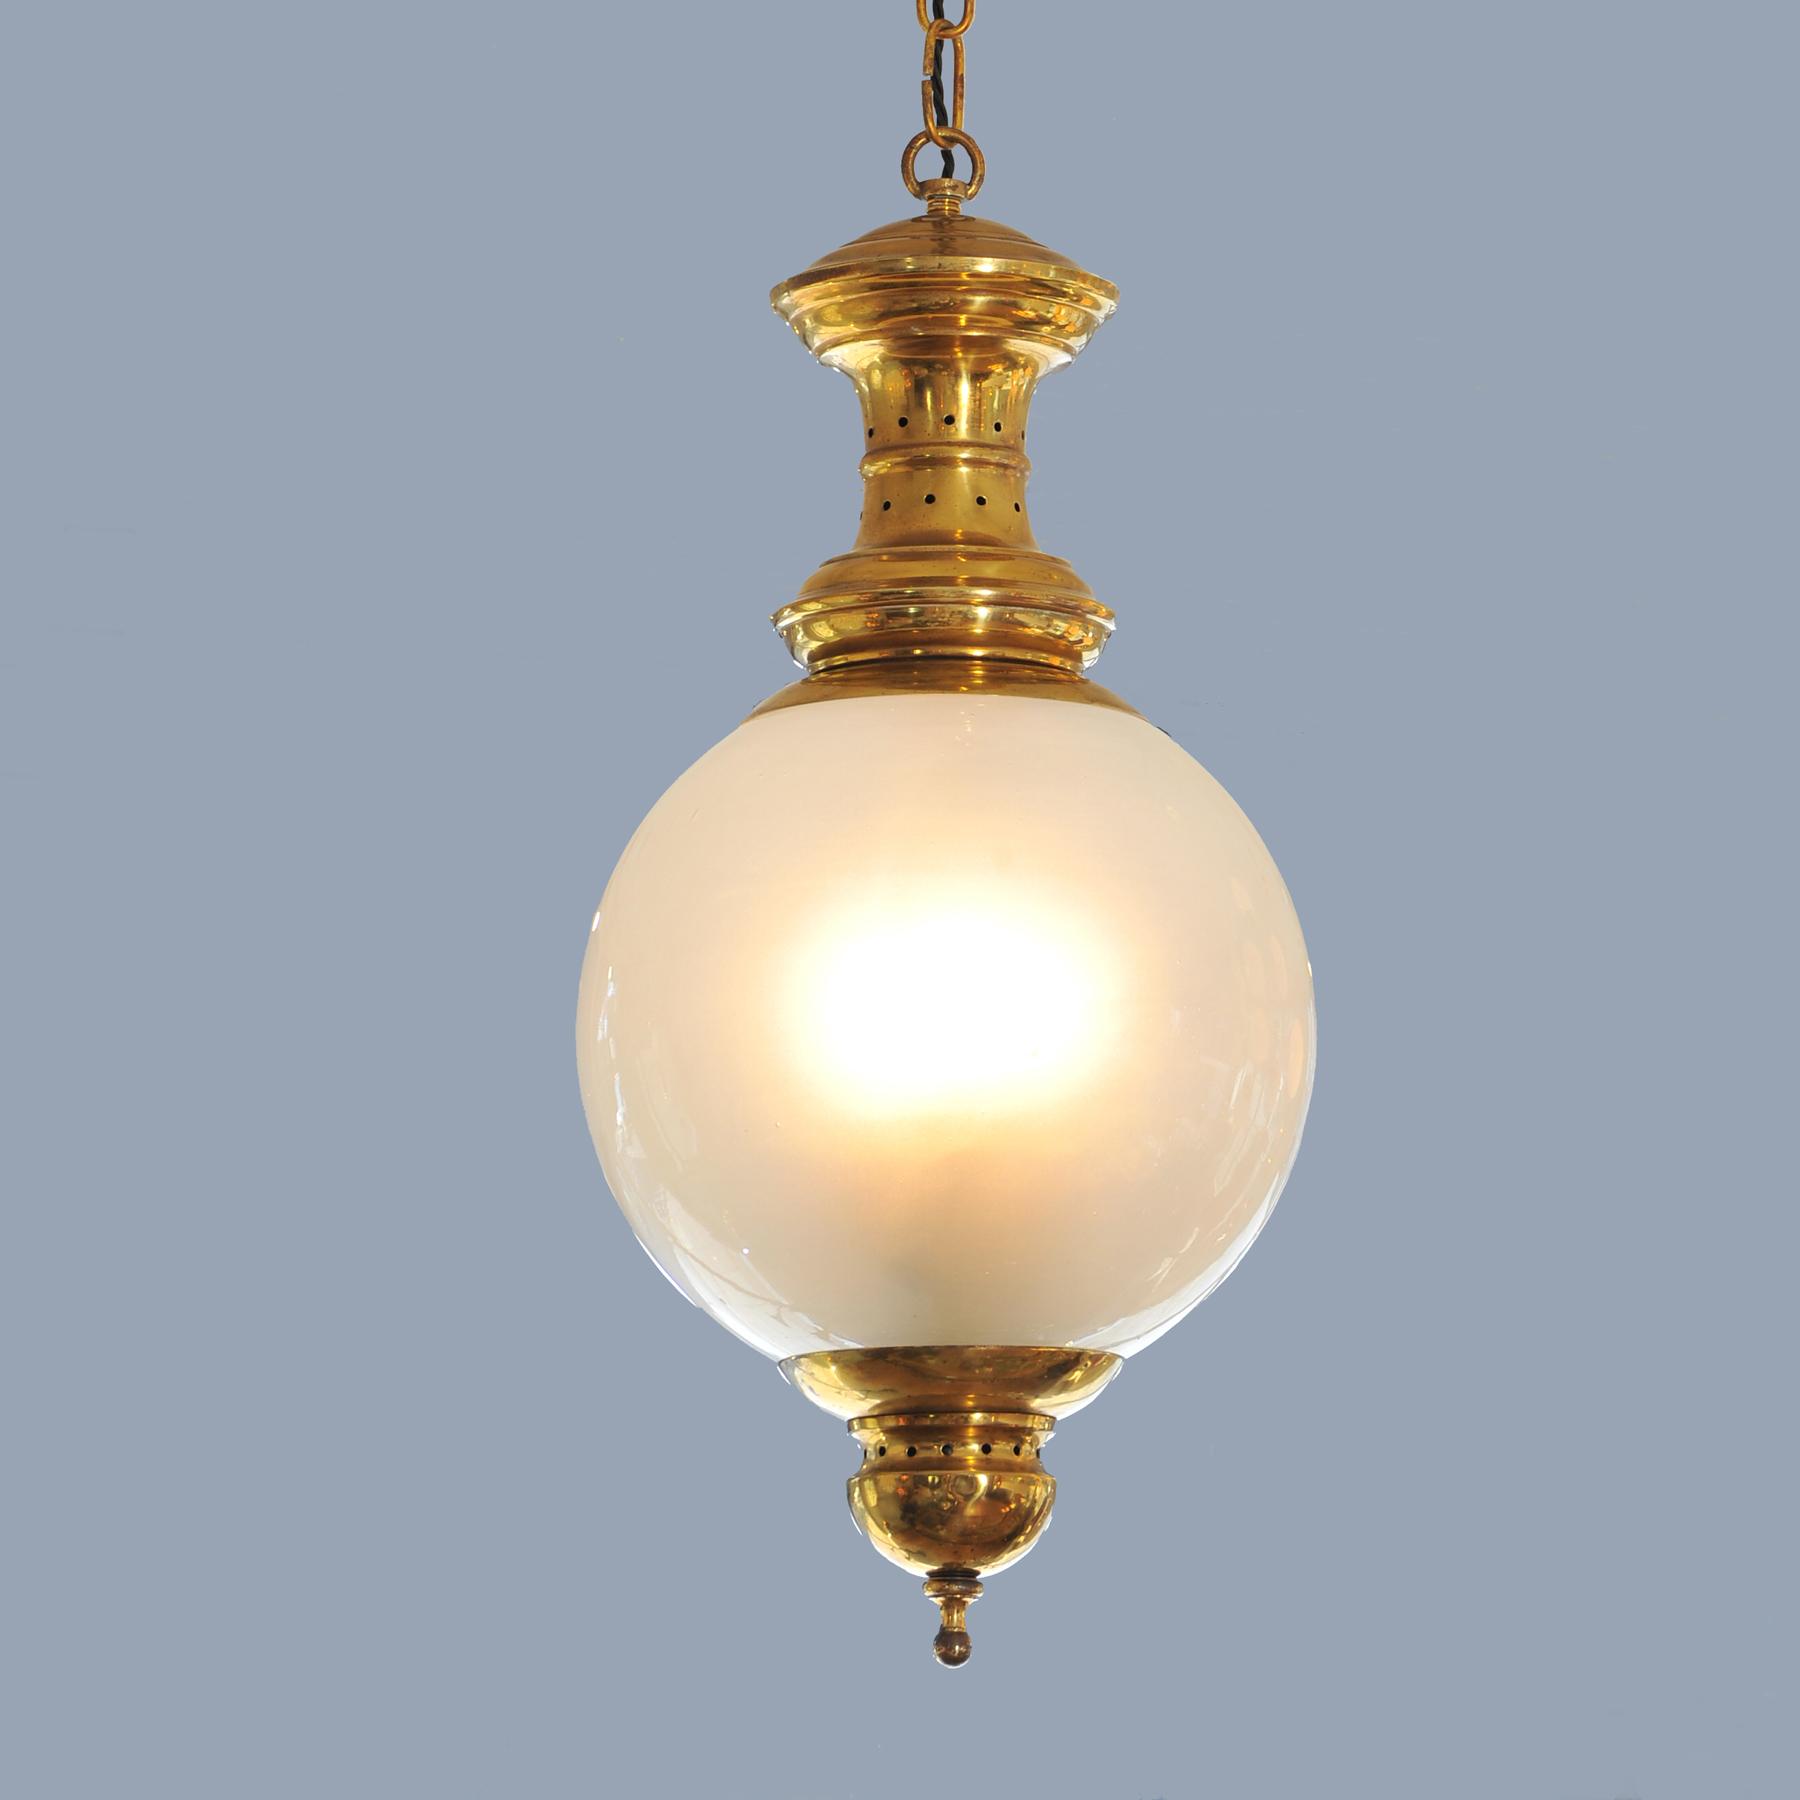 Brass And Glasspendant 05